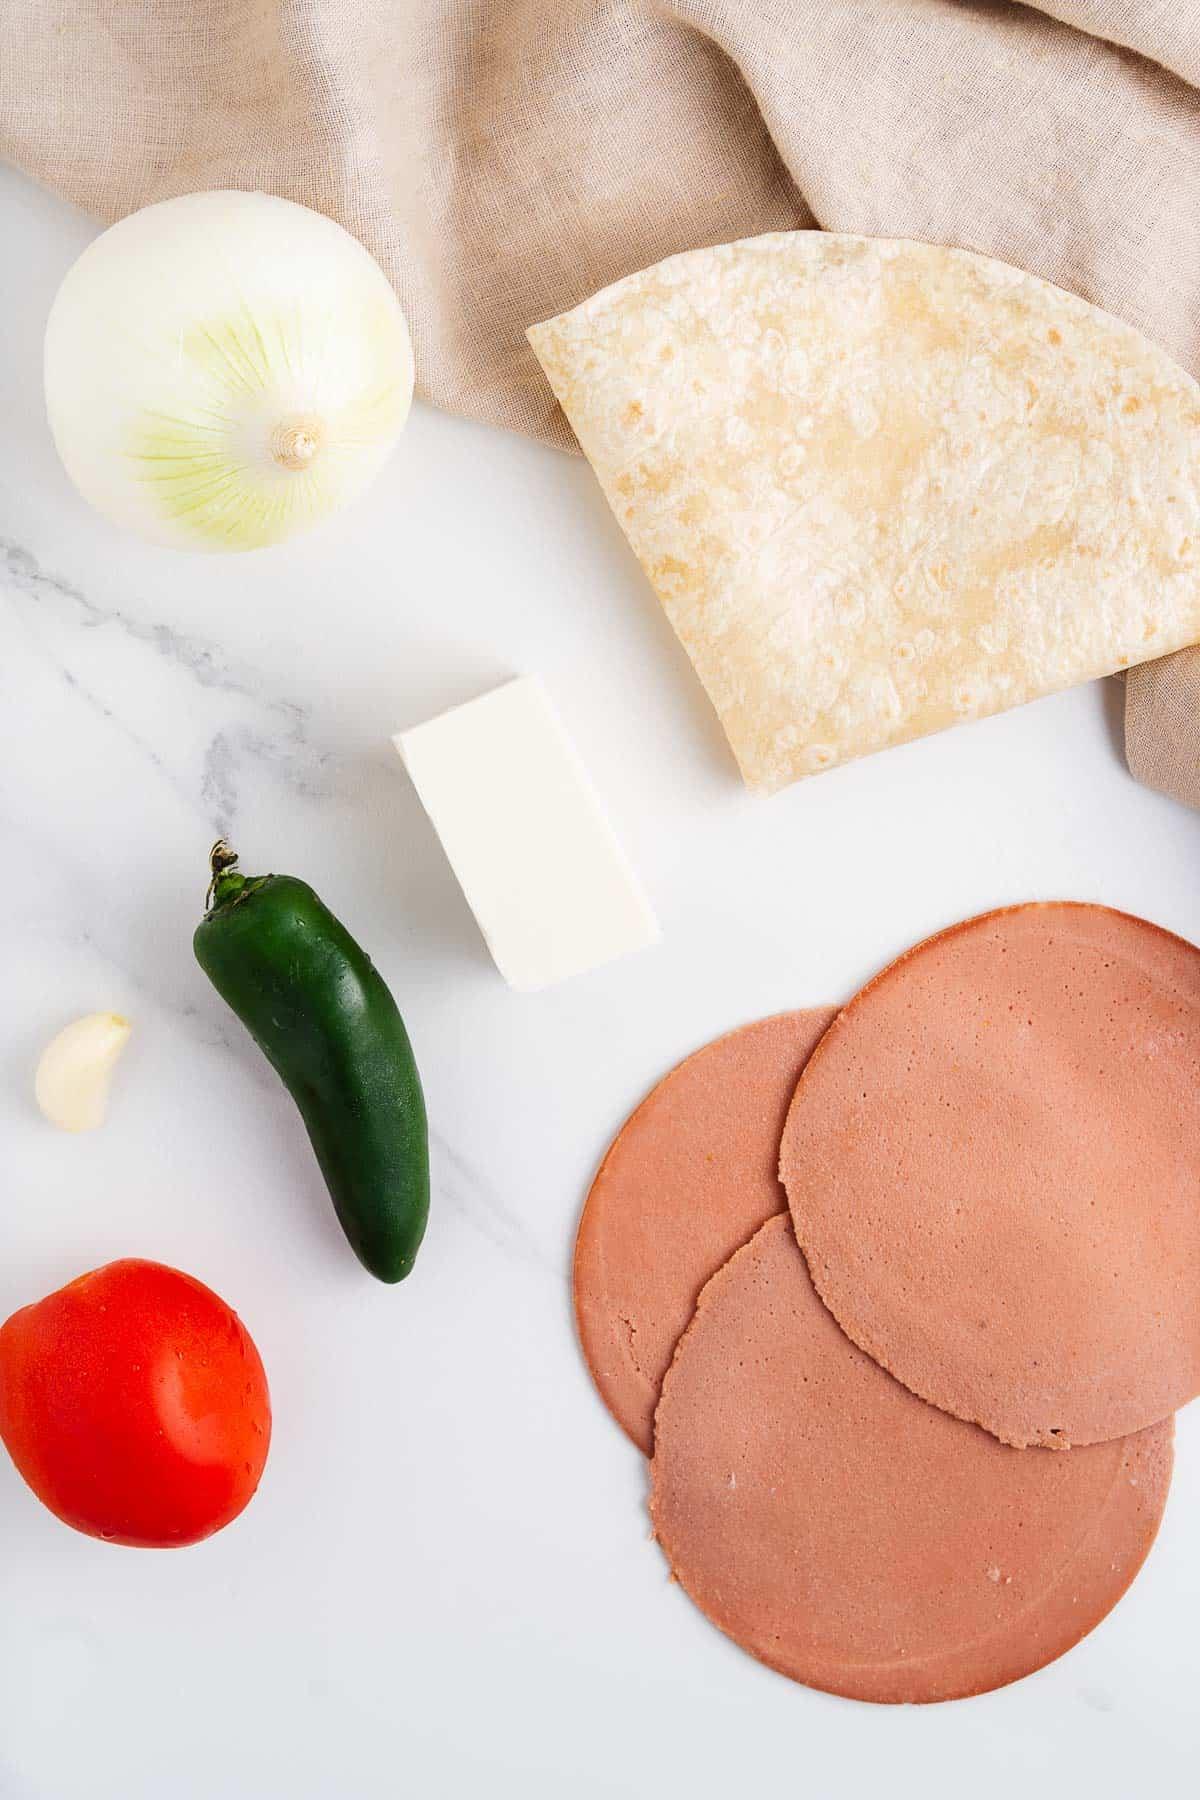 Vegan Cheese, Vegan Ham, Jalapeño, Tomato, Garlic, Onion, and Flour Tortilla